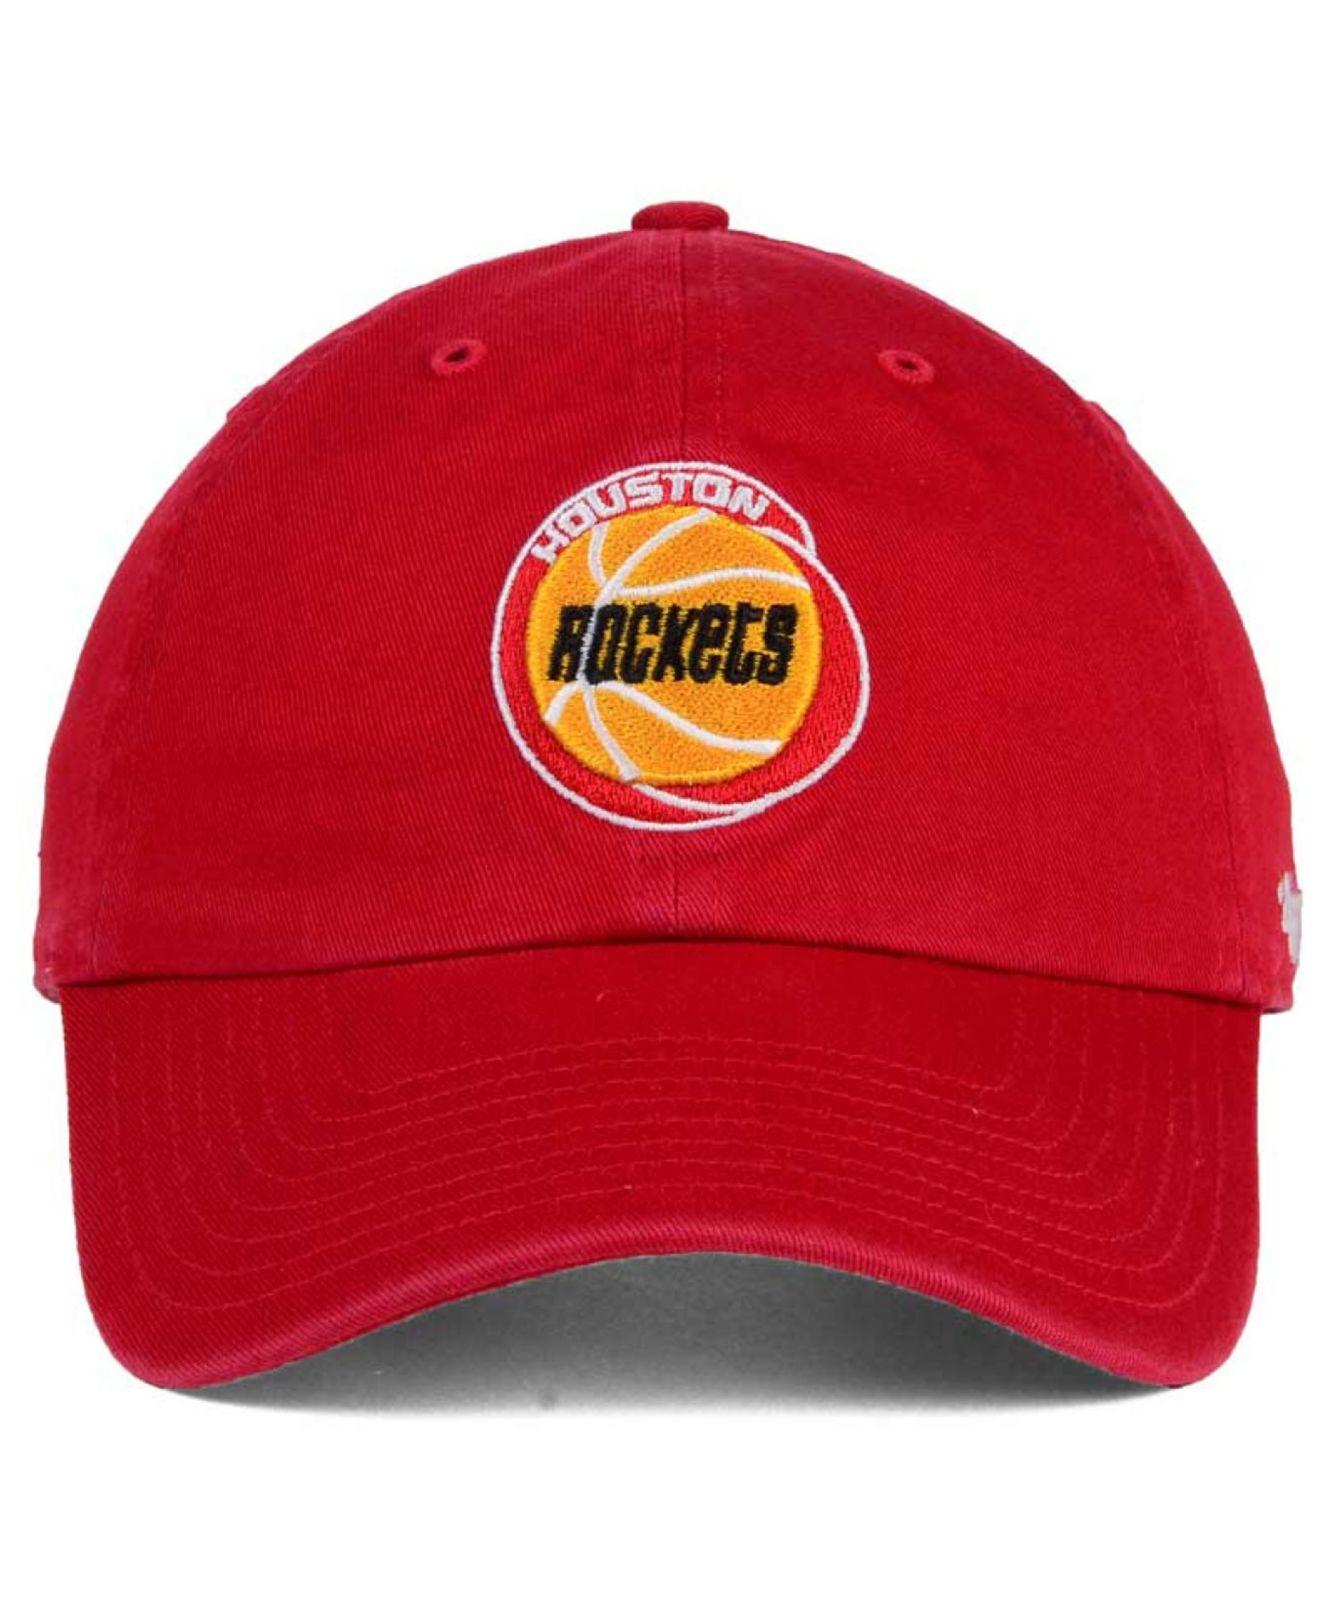 47 Brand Houston Rockets Hardwood Classics Clean Up Cap In